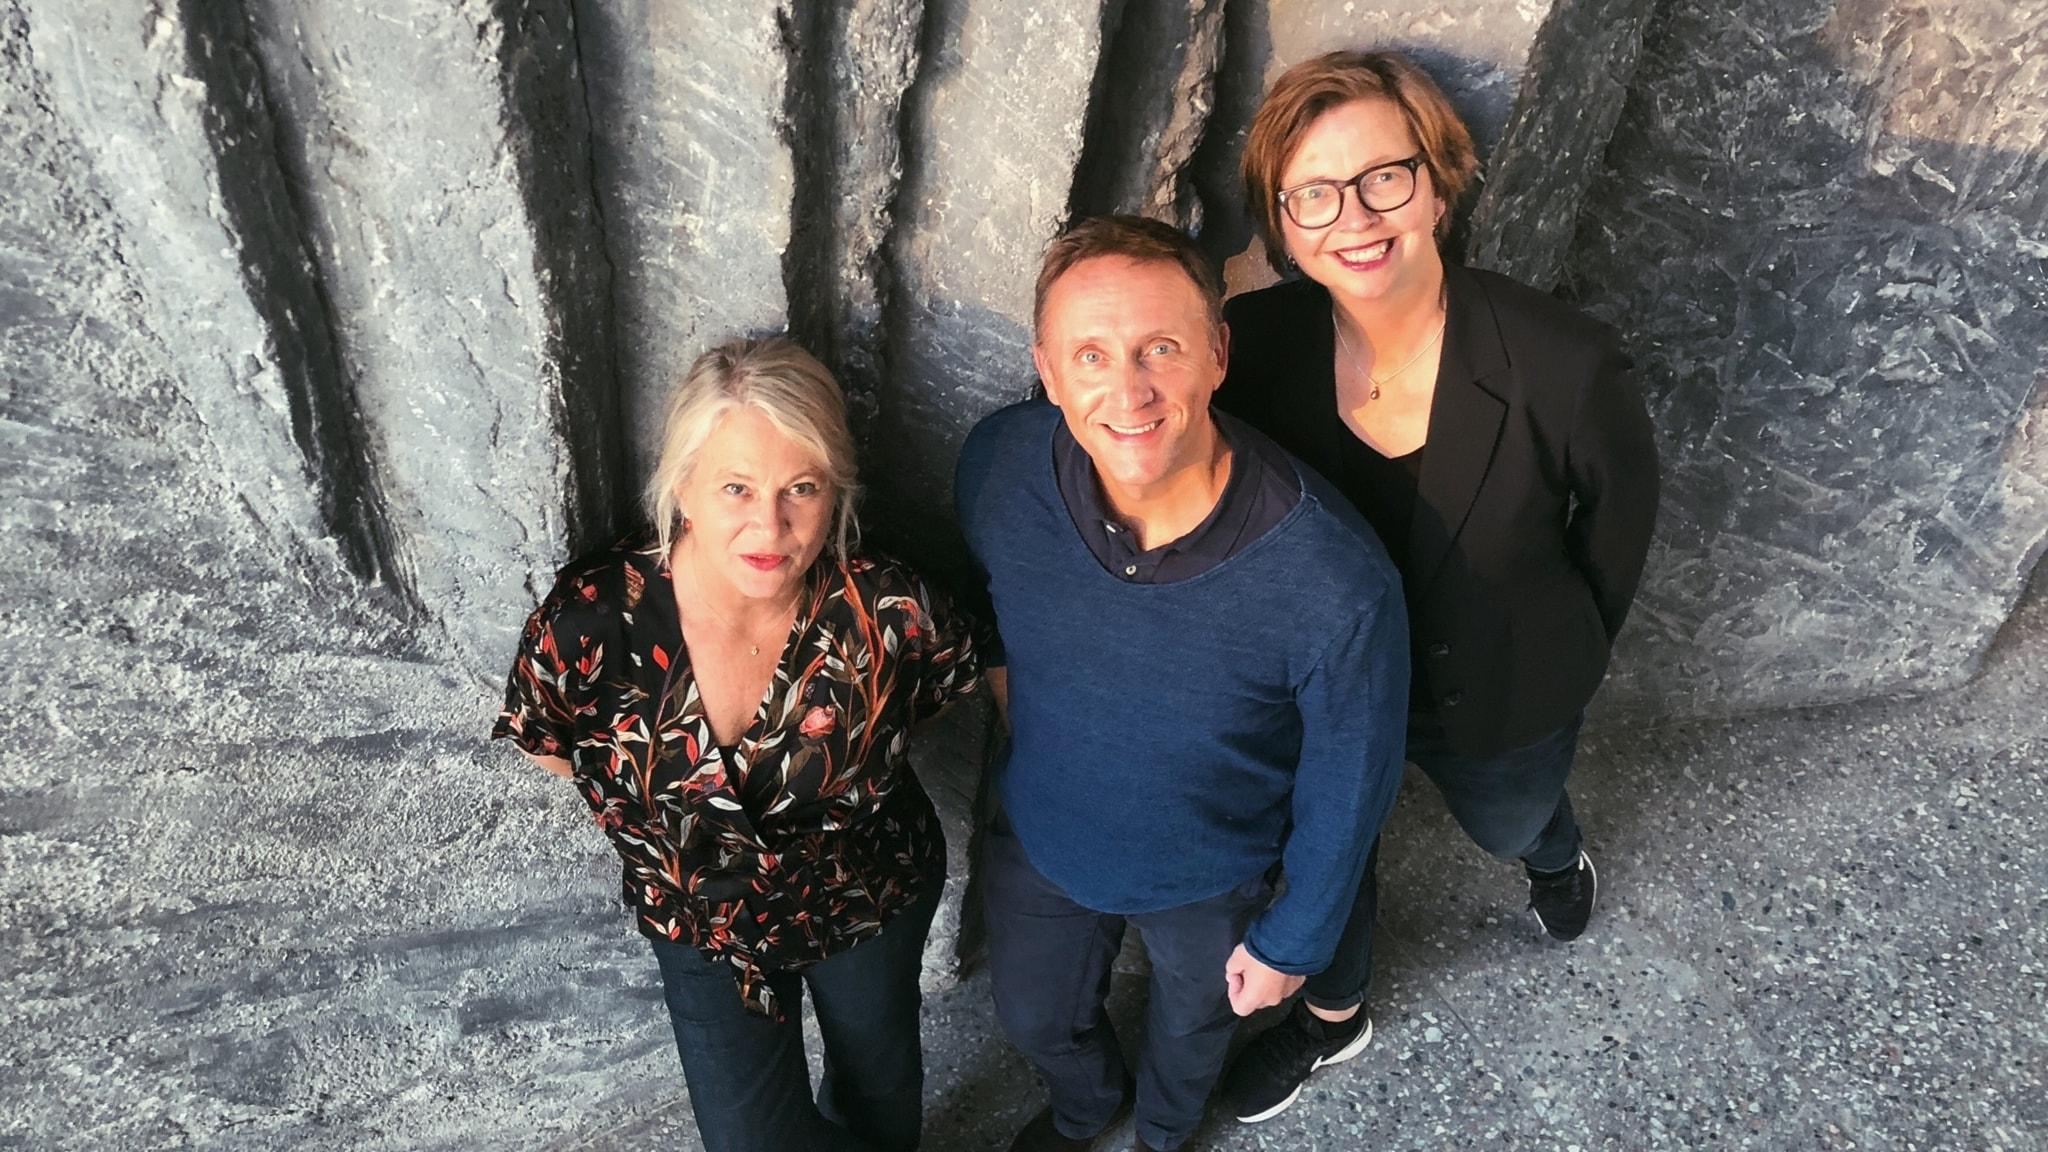 Helena von Zweigbergk, Göran Everdahl och Maja Aase